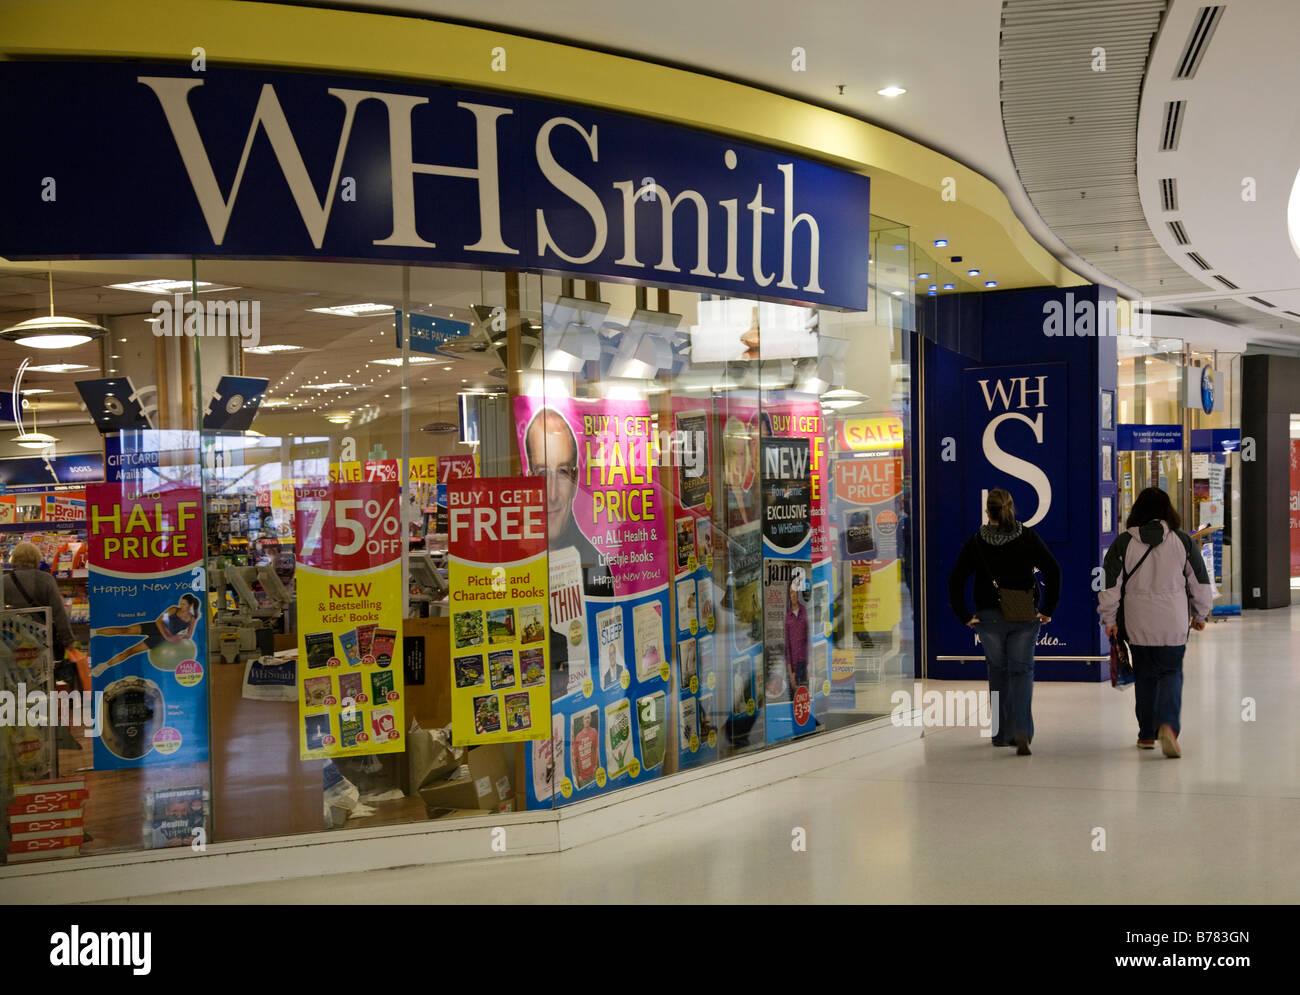 WH Smith's store Braehead shopping centre, Renfrewshire, Scotland. - Stock Image